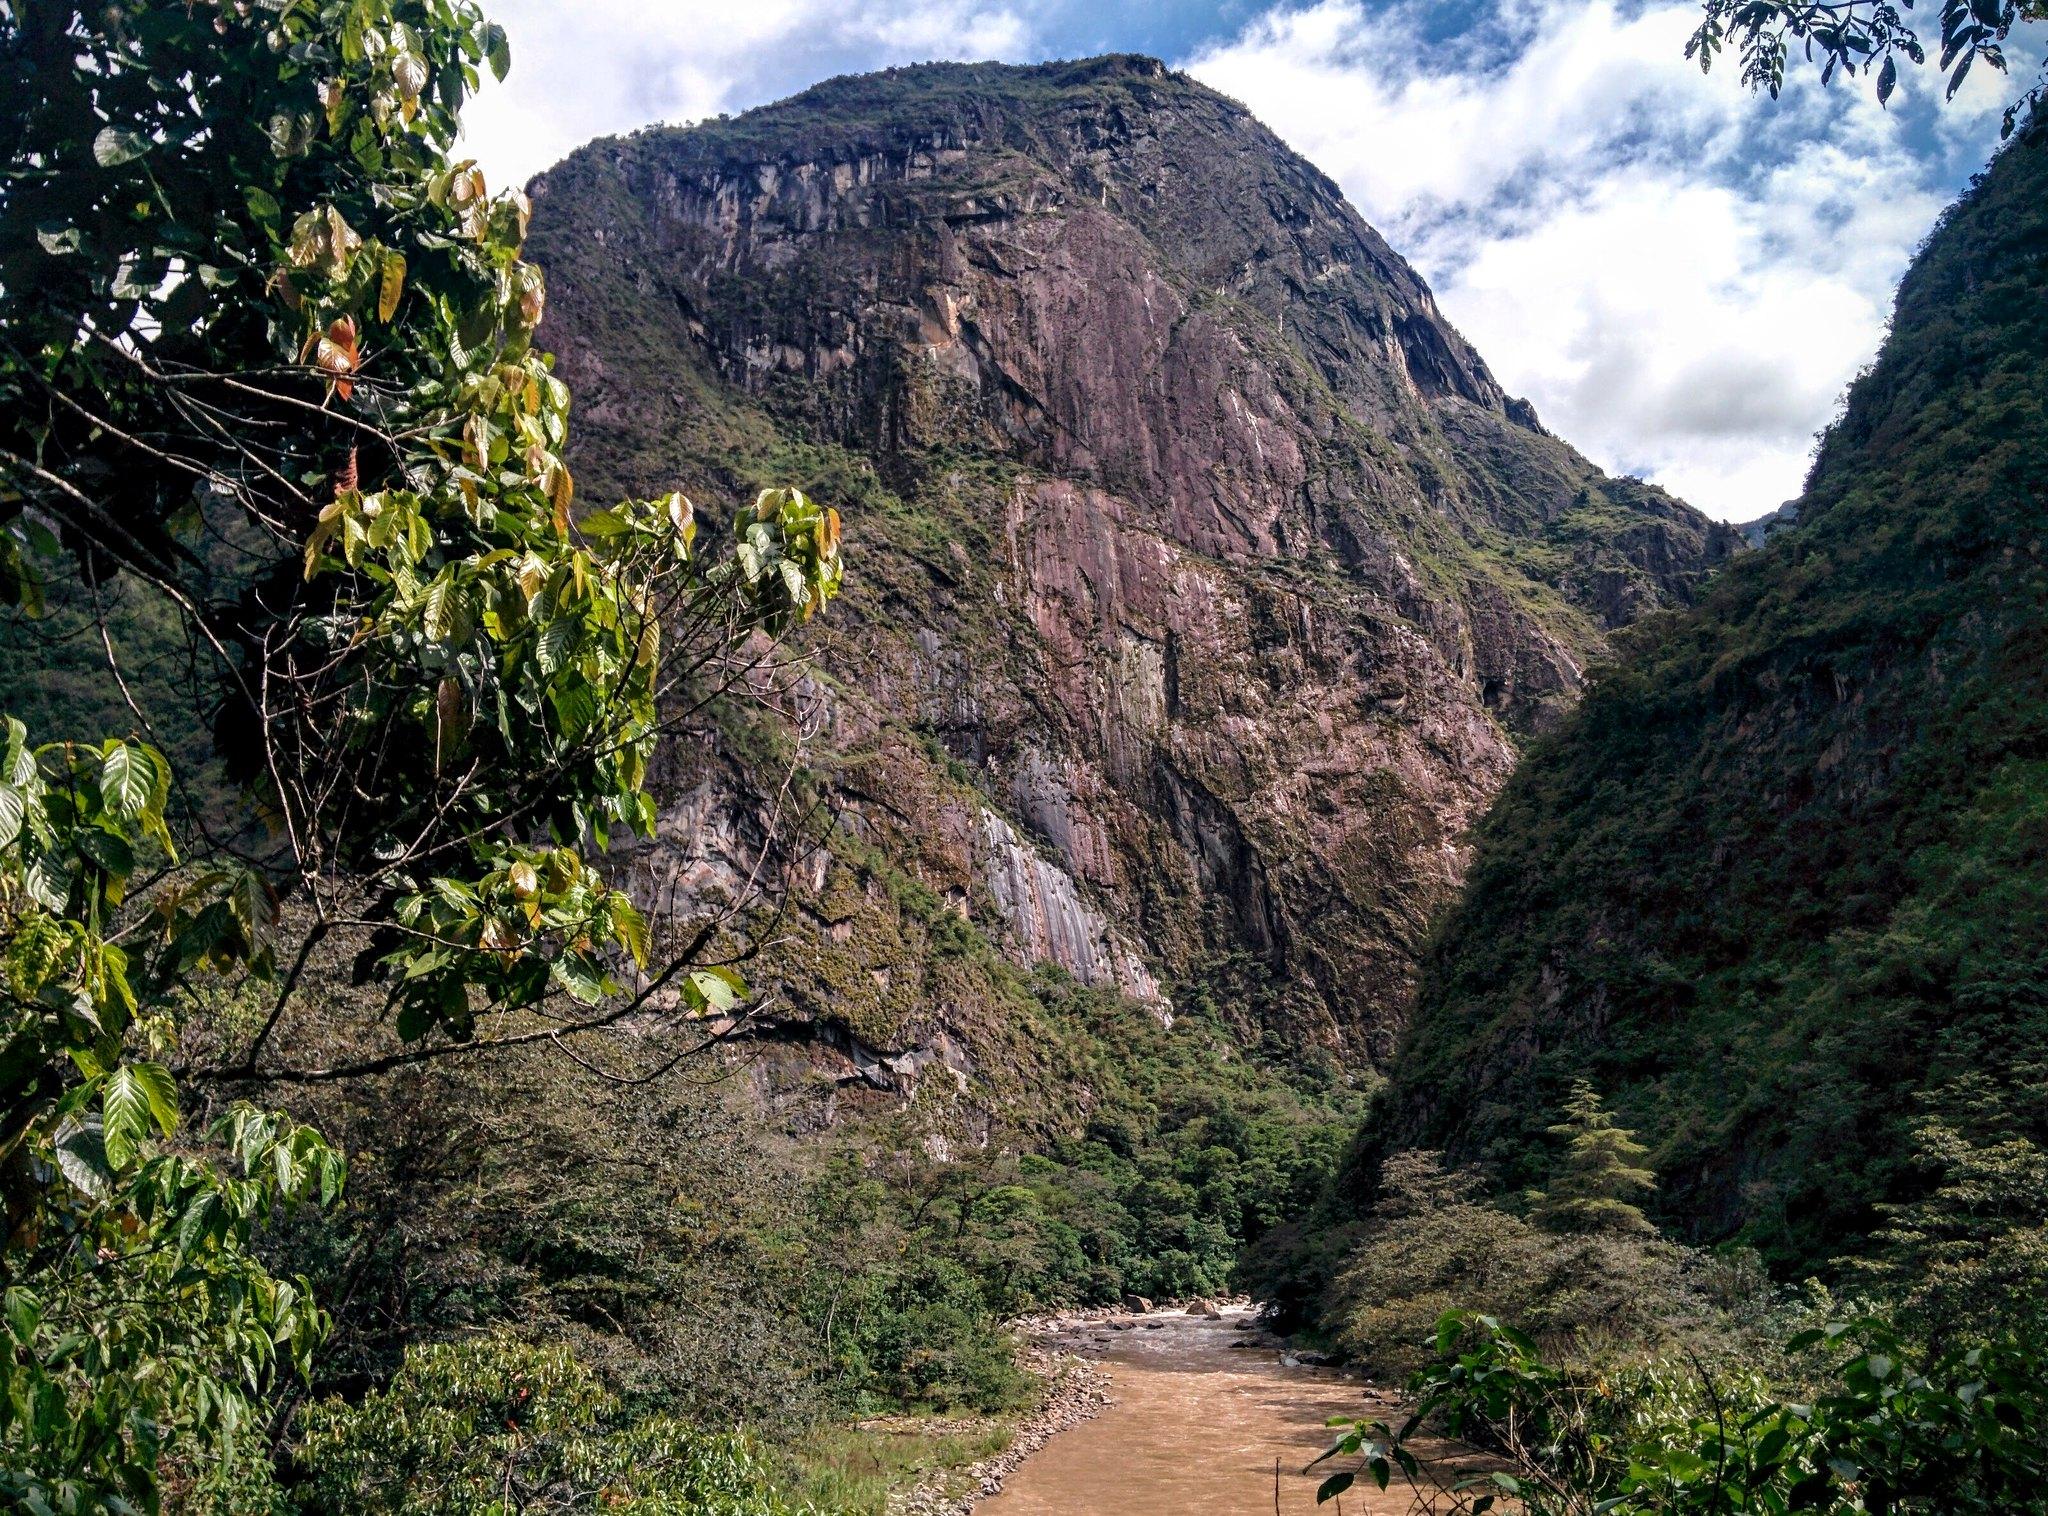 Machu Picchu mountain towering above us